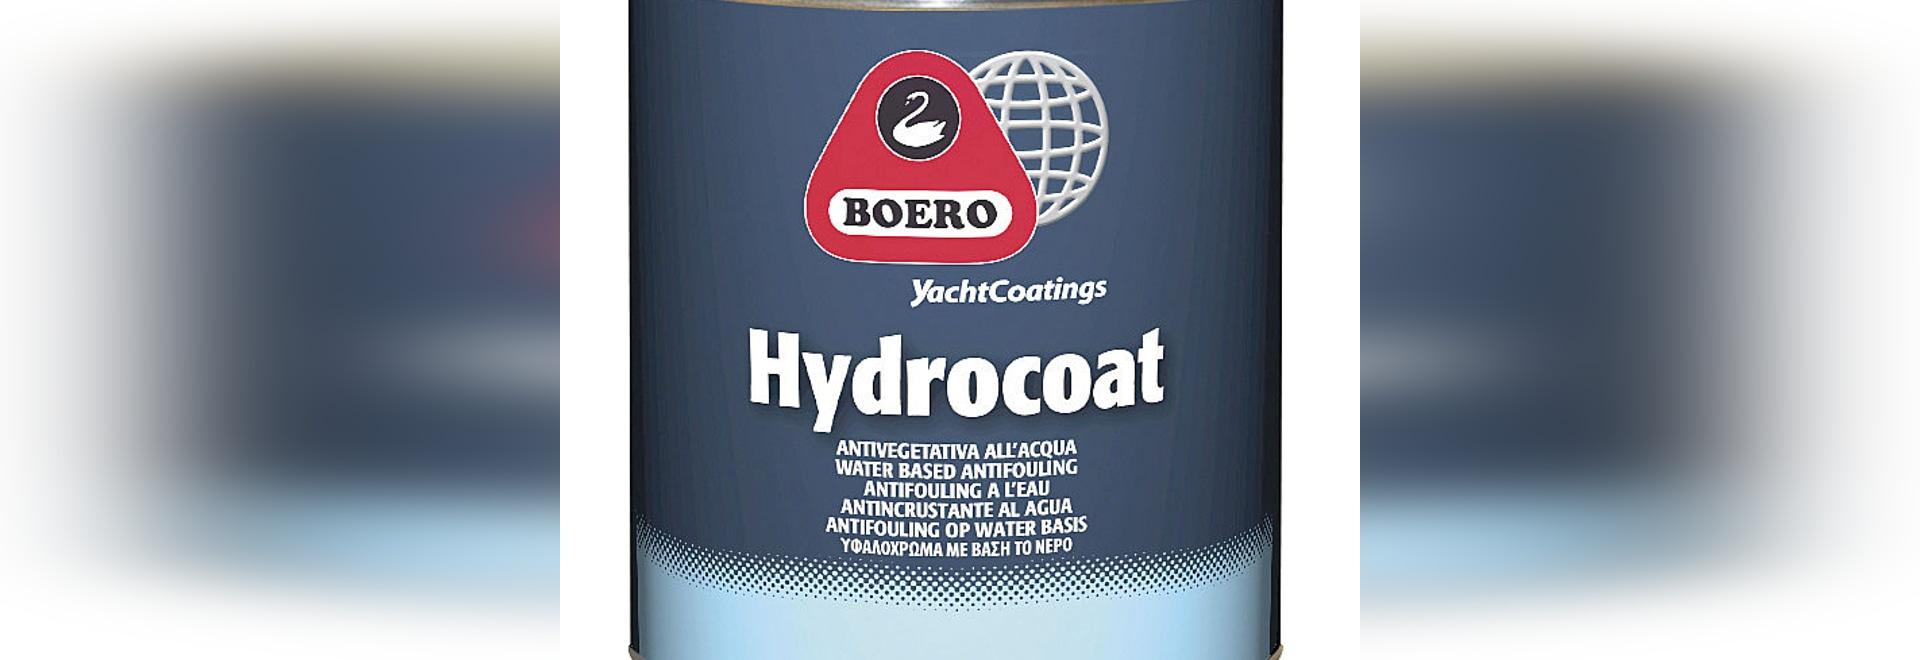 Hydrocoat Antifouling